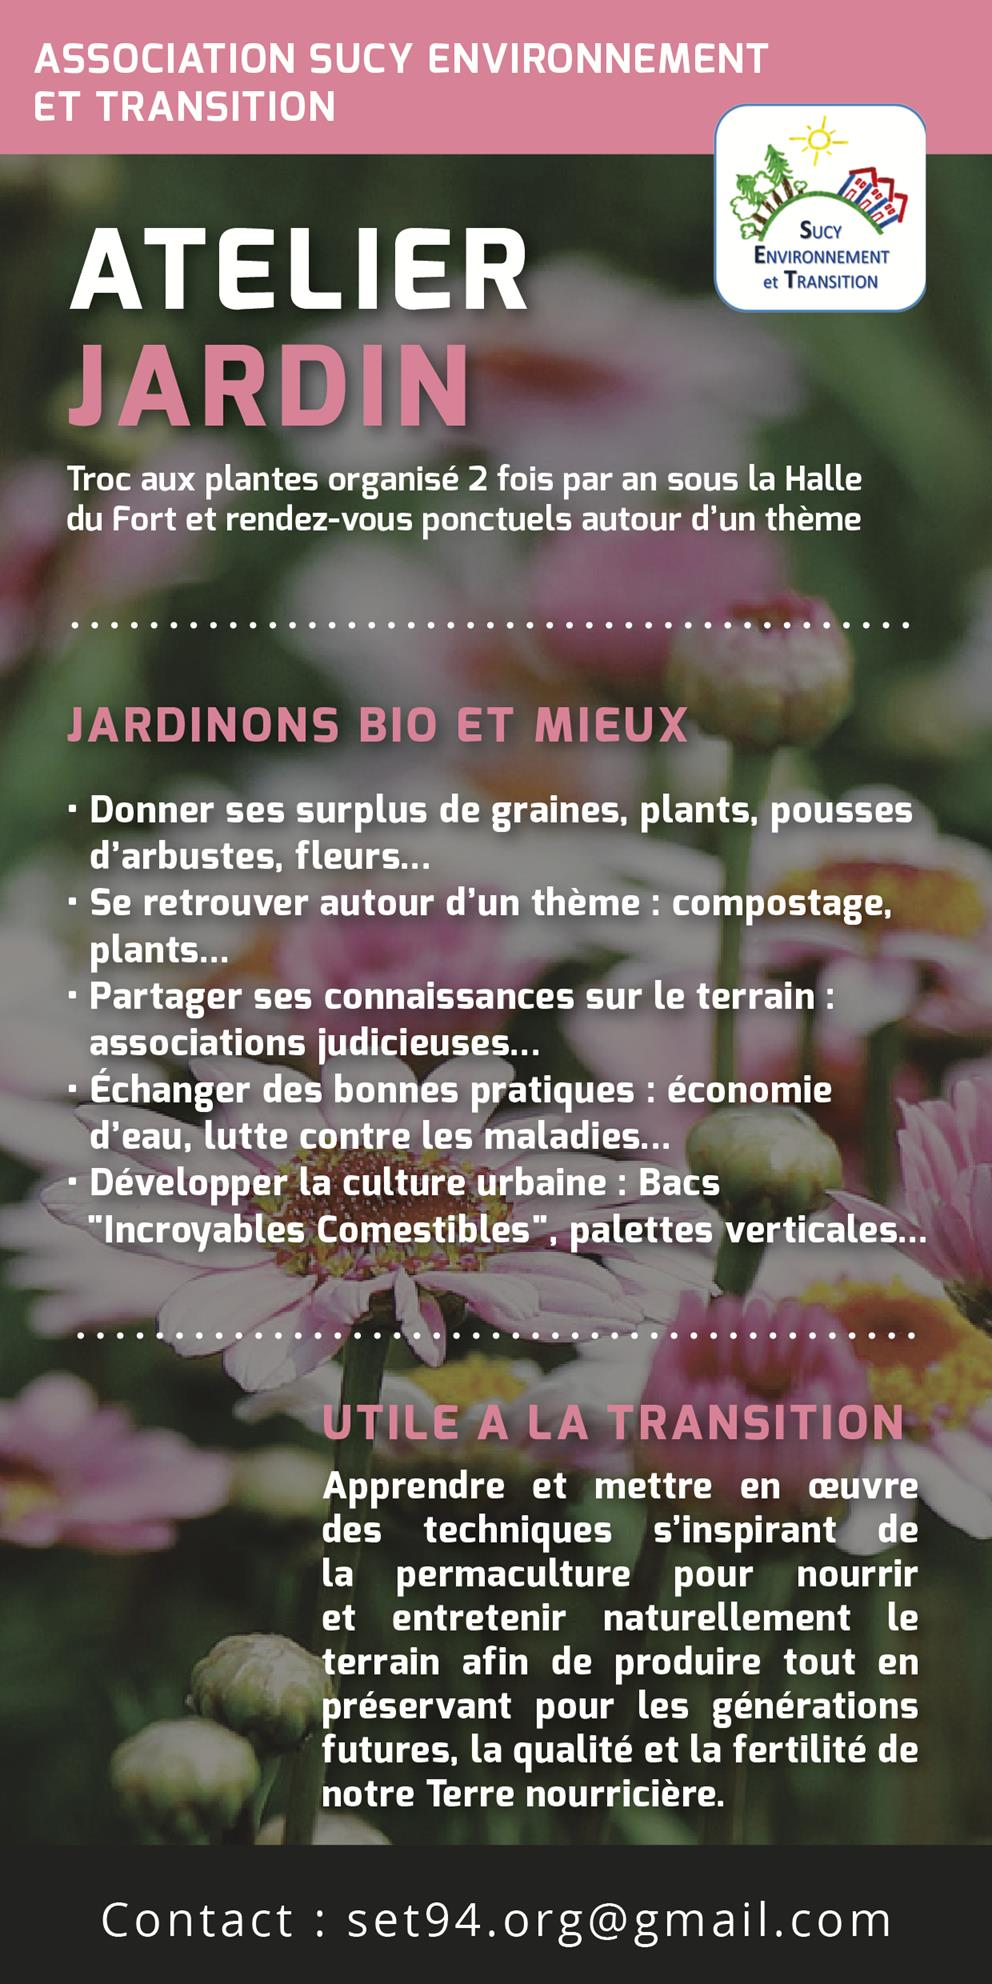 Atelier_Jardin (Copy)